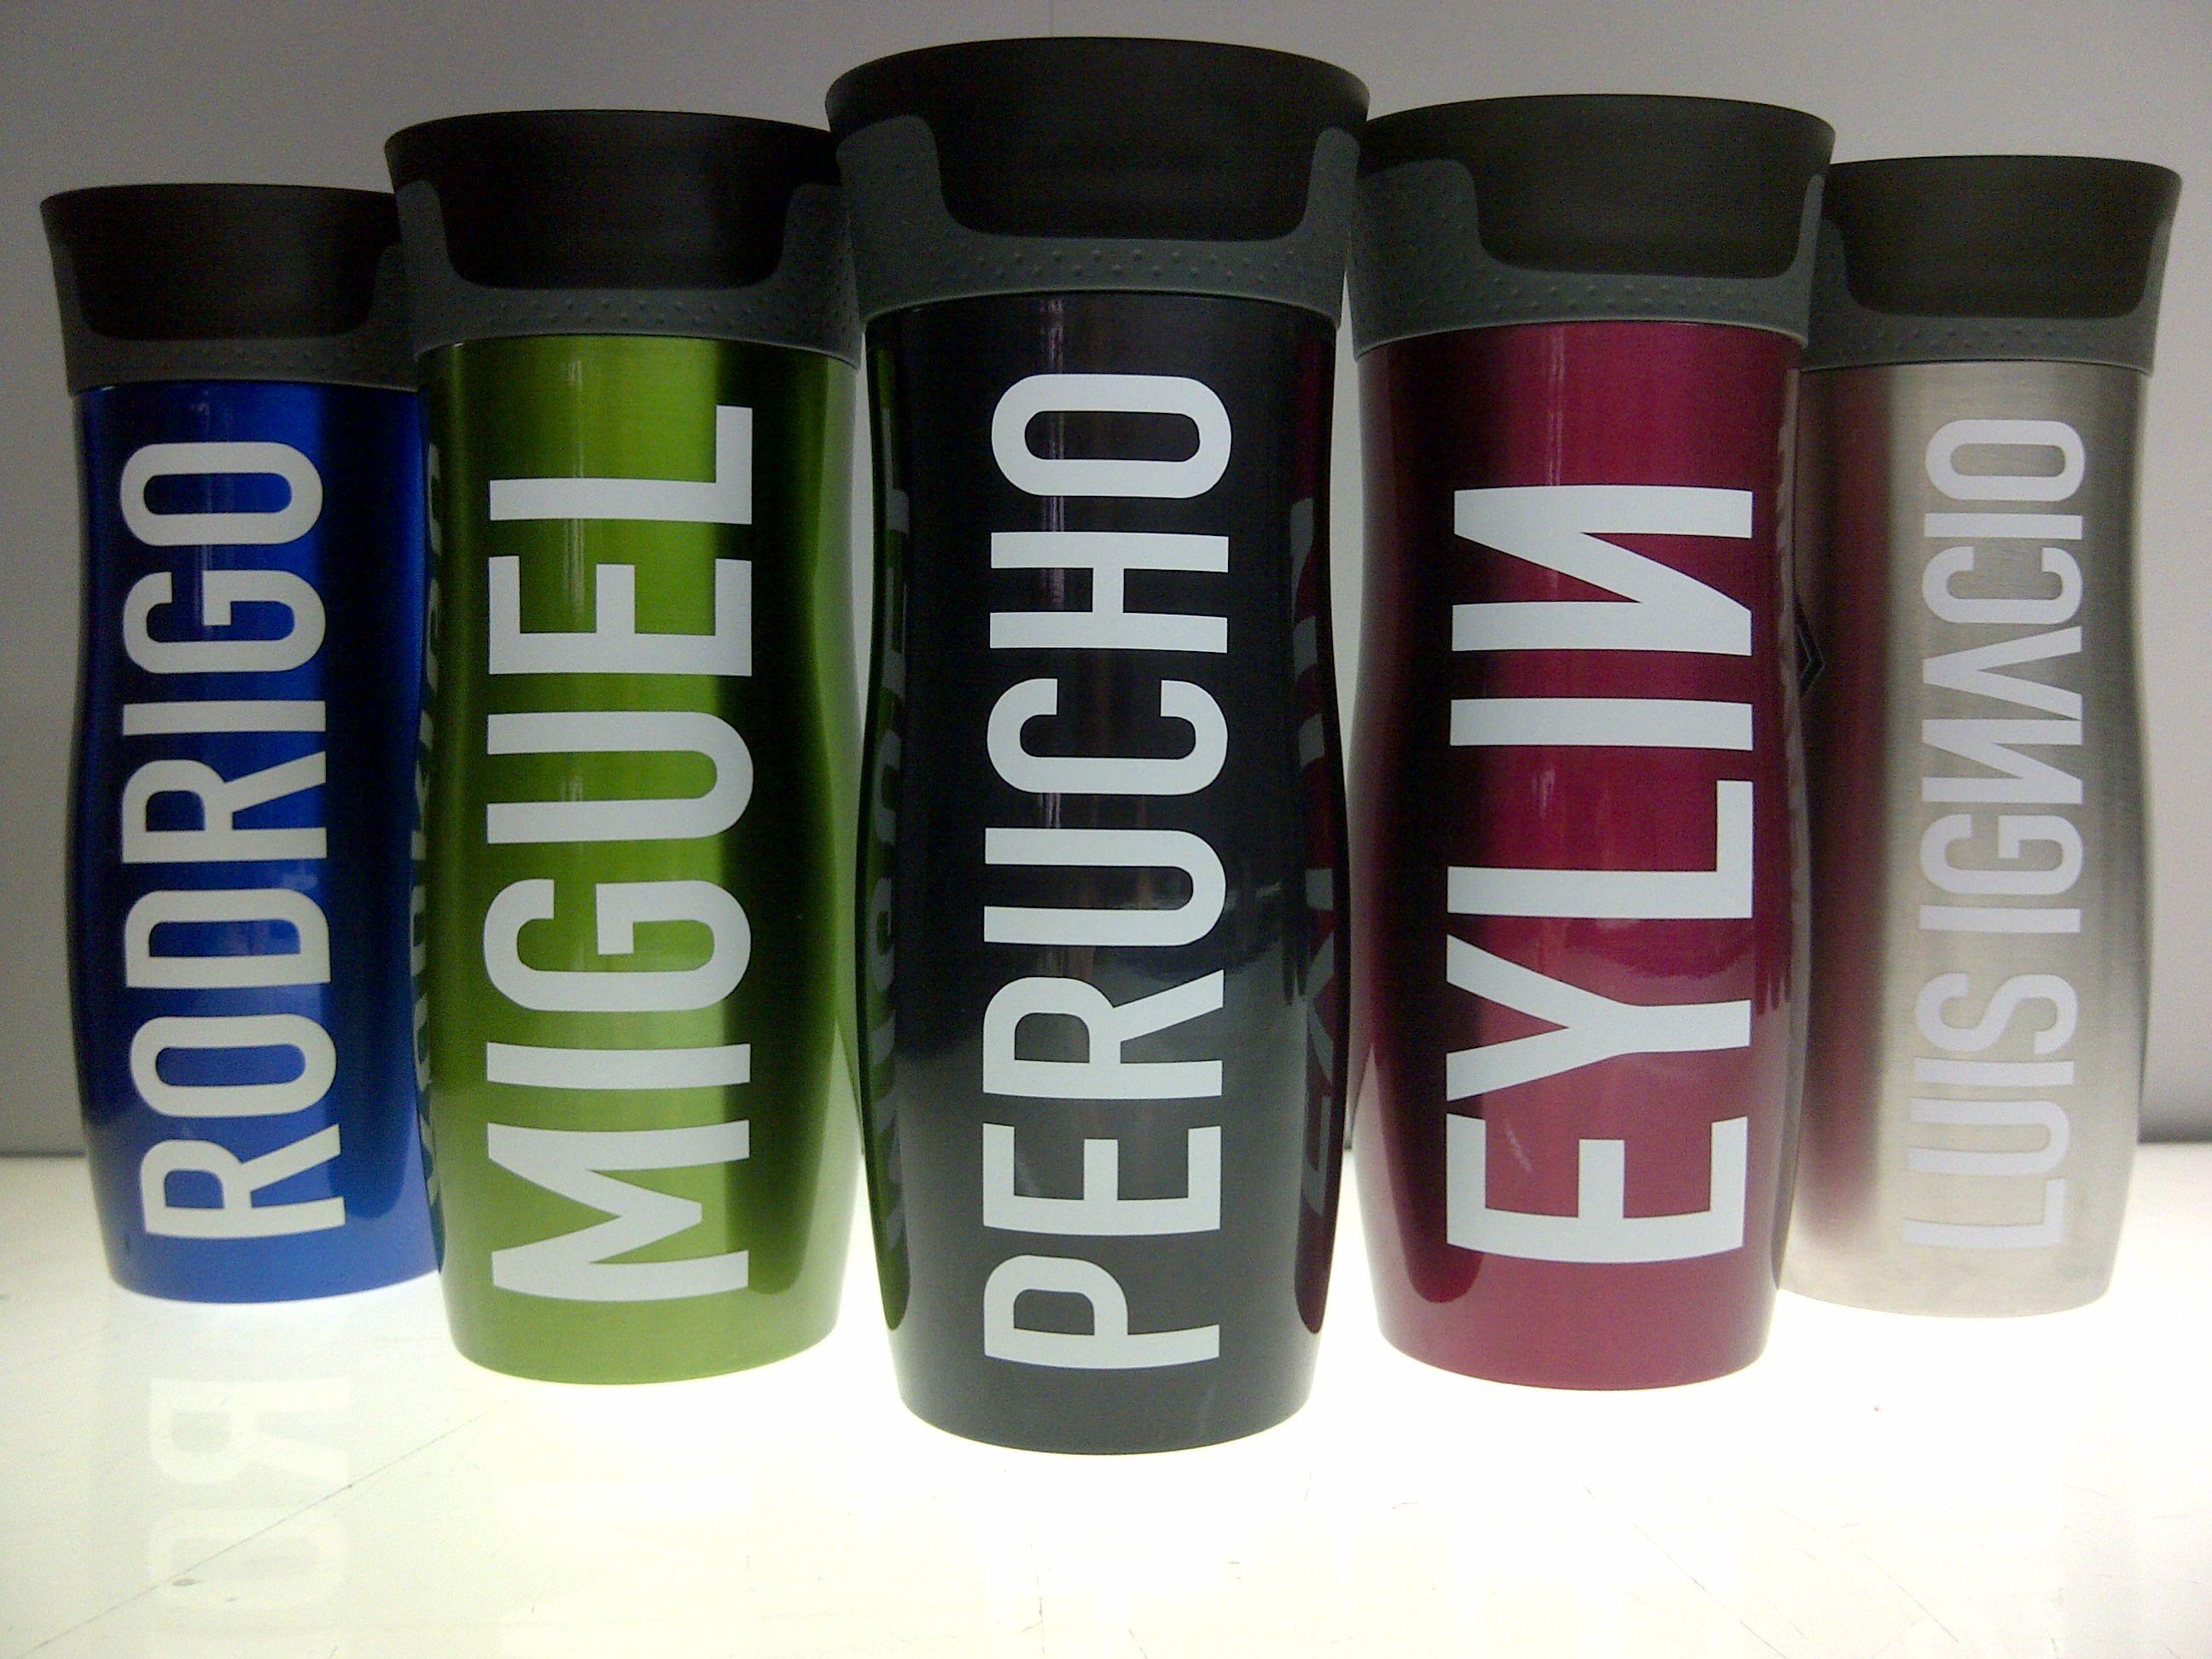 Vasos termicos metalizados vasos contigo personalizados pinterest - Vasos personalizados ...